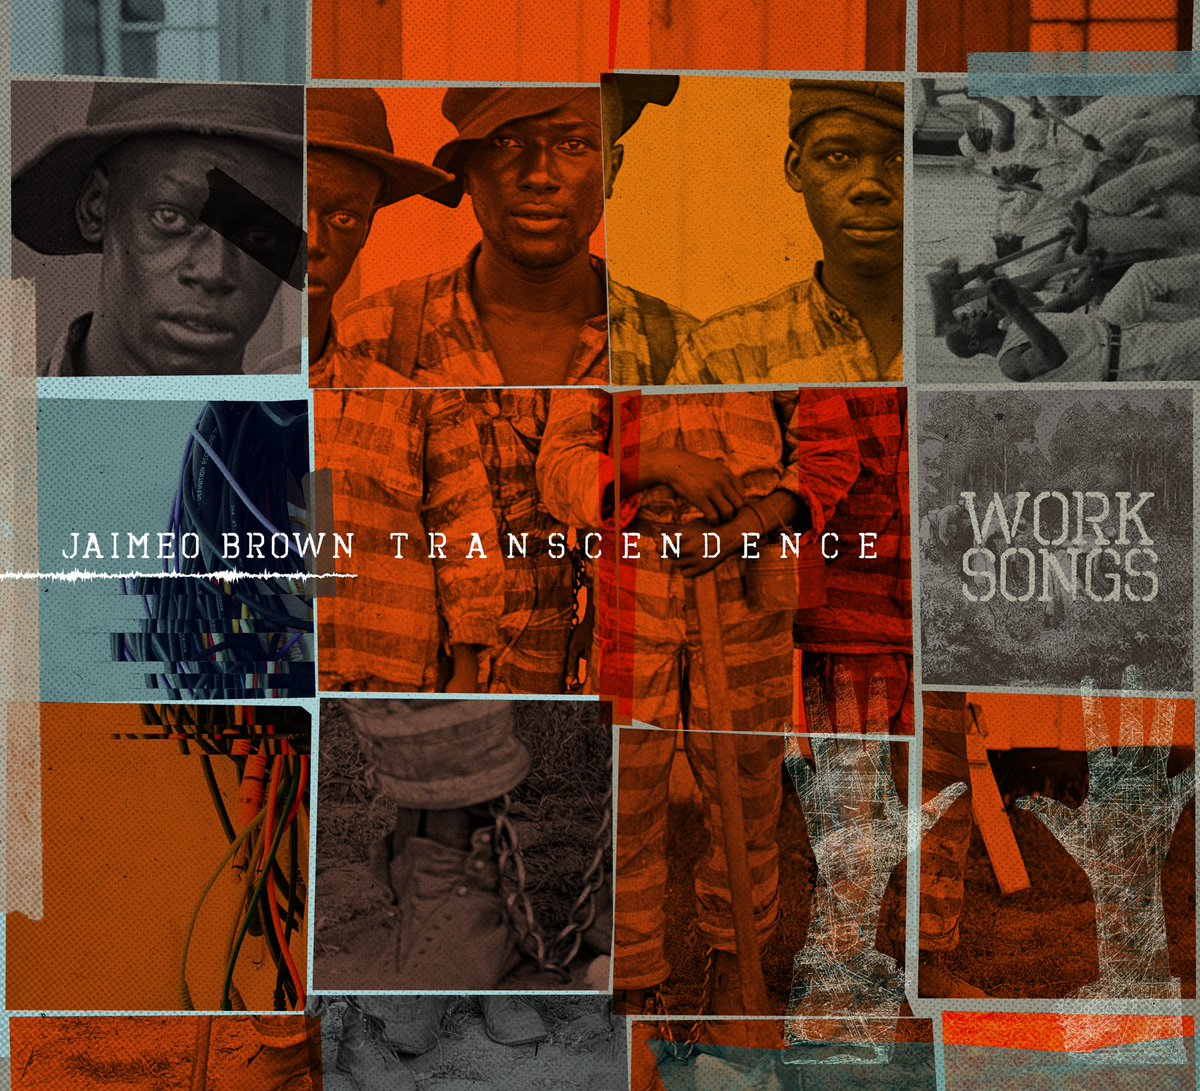 Review of Jaimeo Brown Transcendence: Work Songs